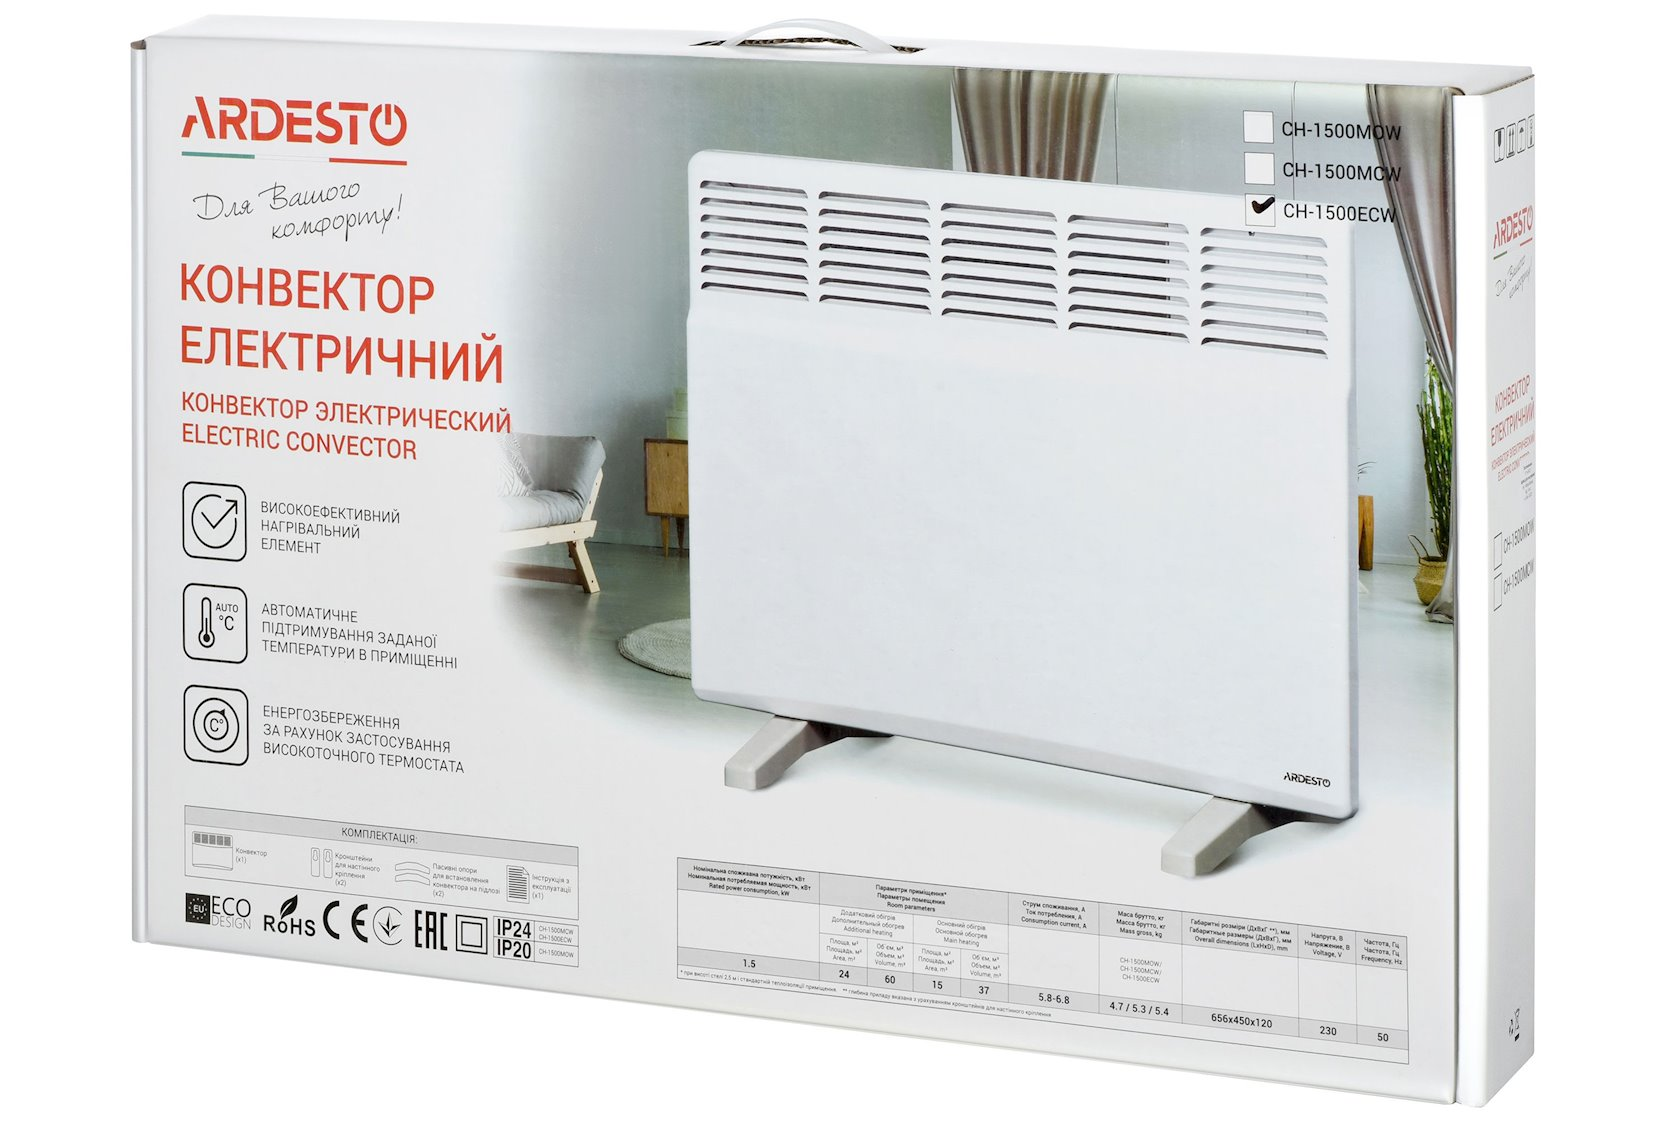 Konvektor Ardesto CH-1500ECW